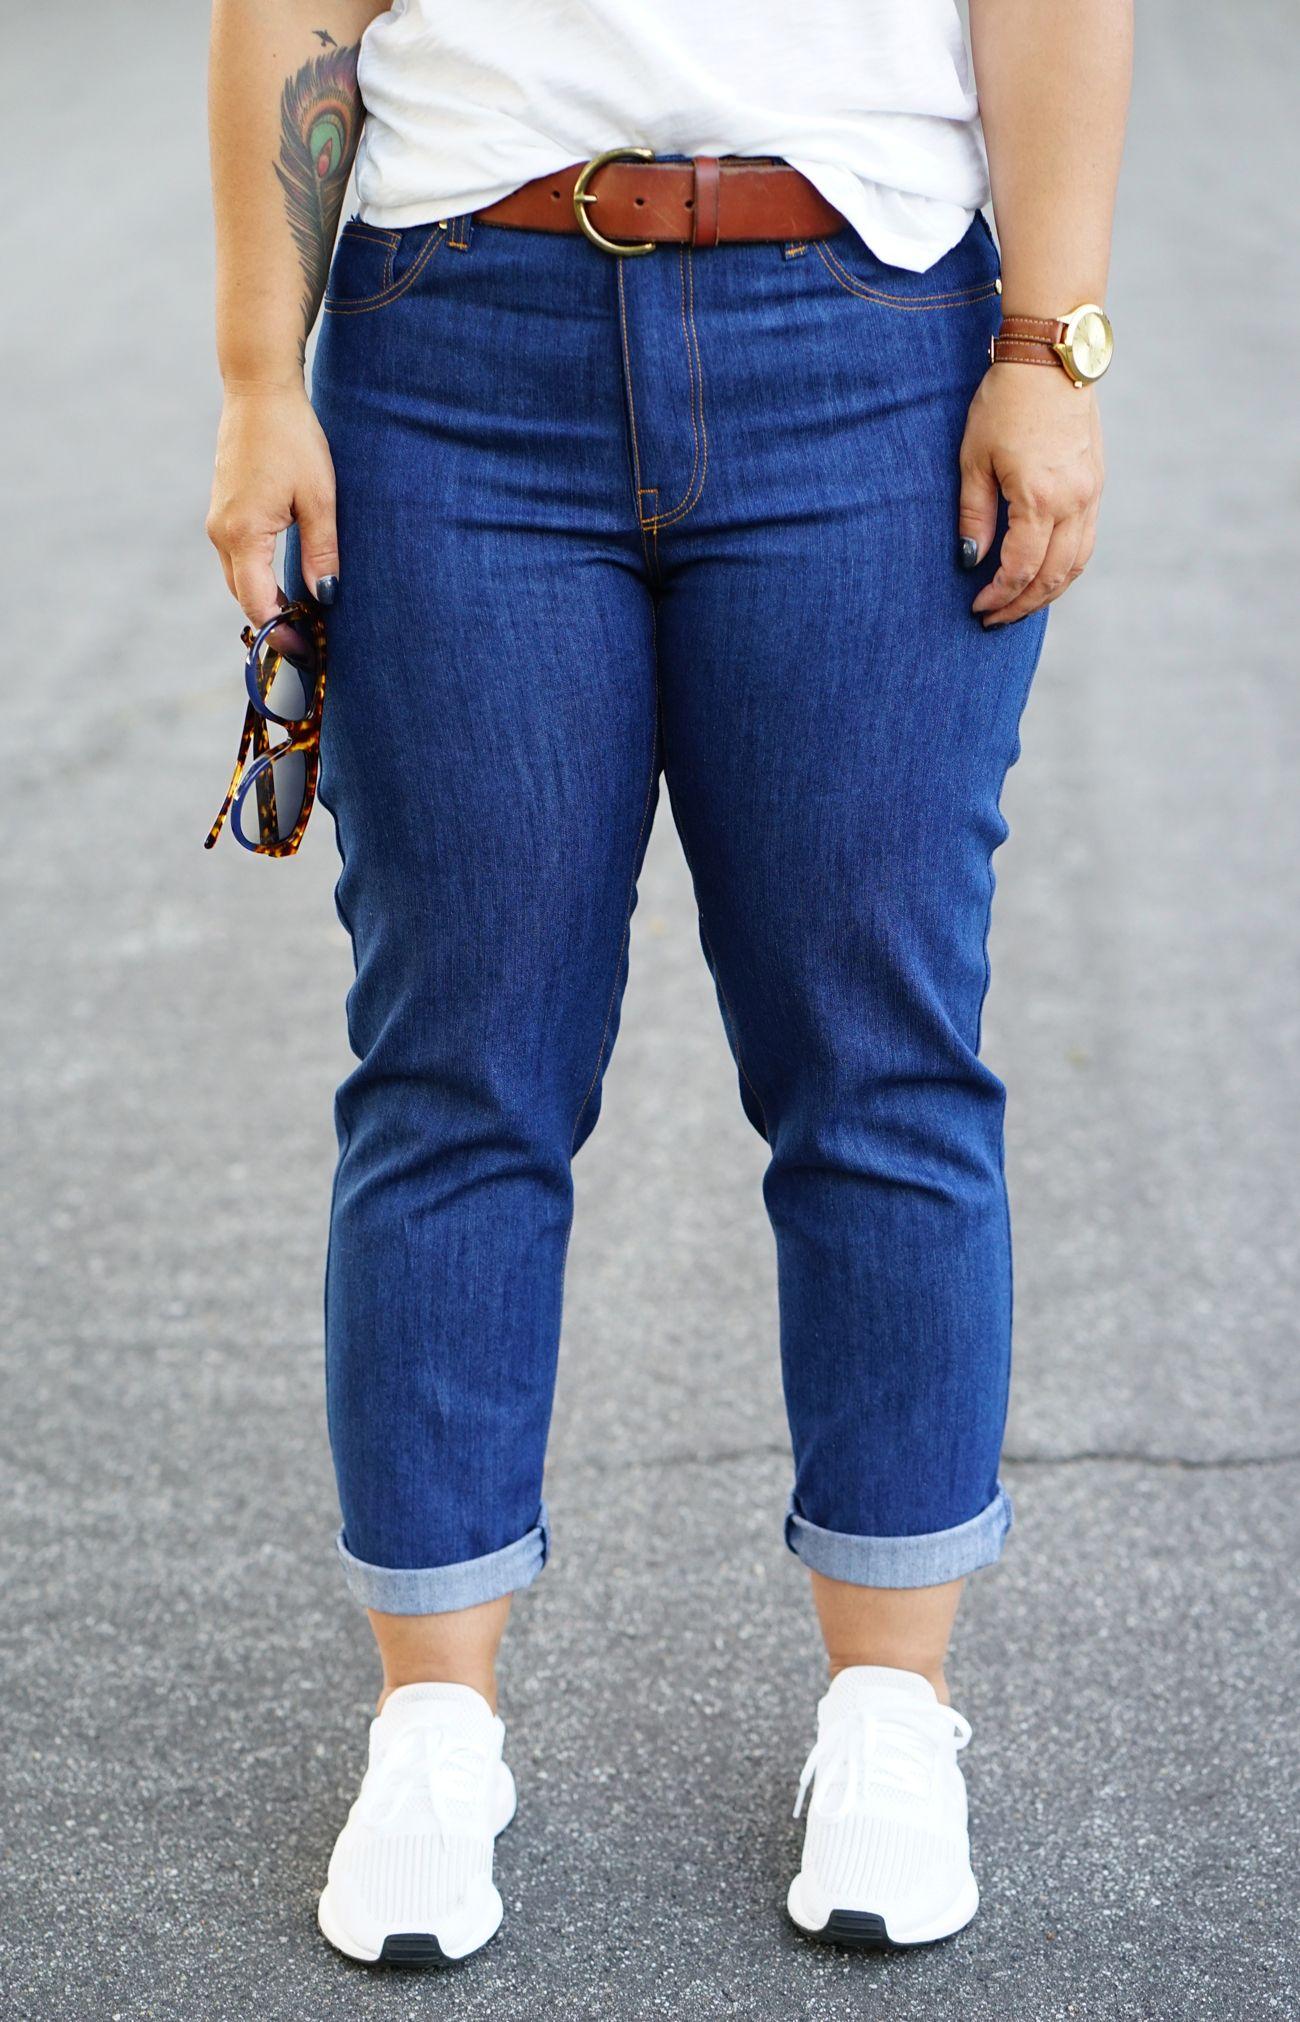 Diy Boyfriend Jeans Using Closet Case Morgan Jeans Pattern